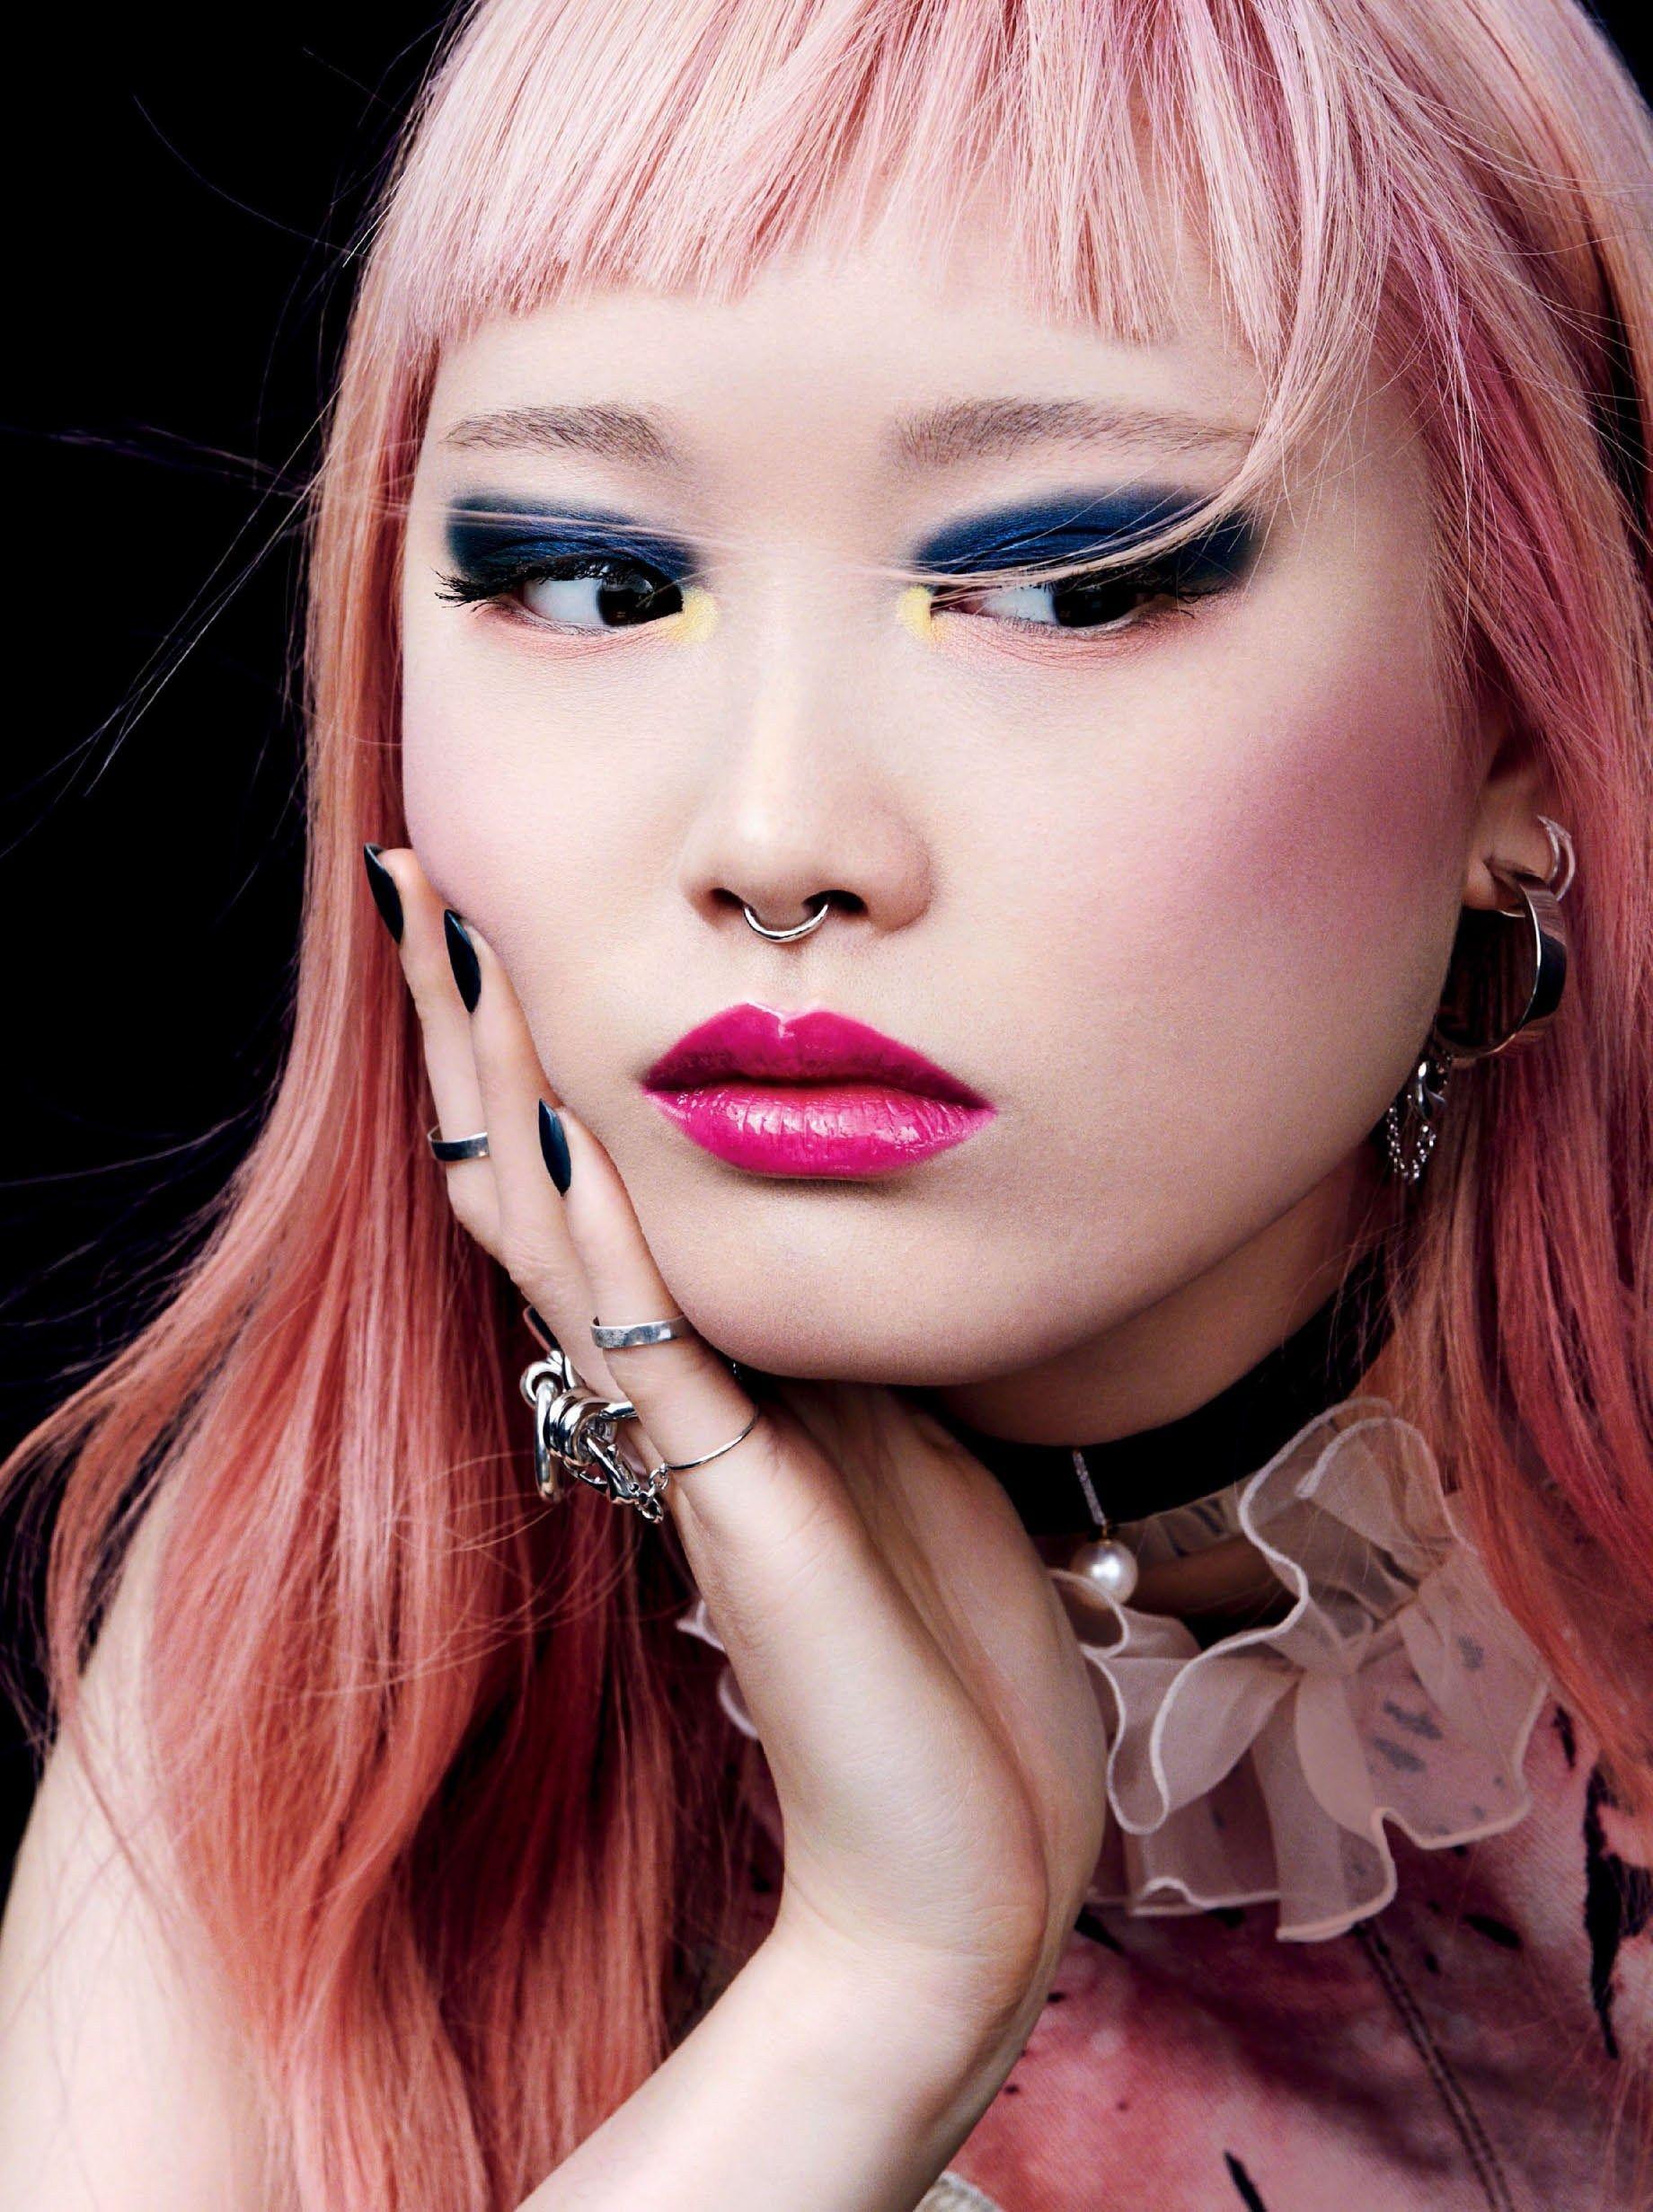 Be Bold Fernanda Ly for Glamour US February 2017 フェルナンダリー